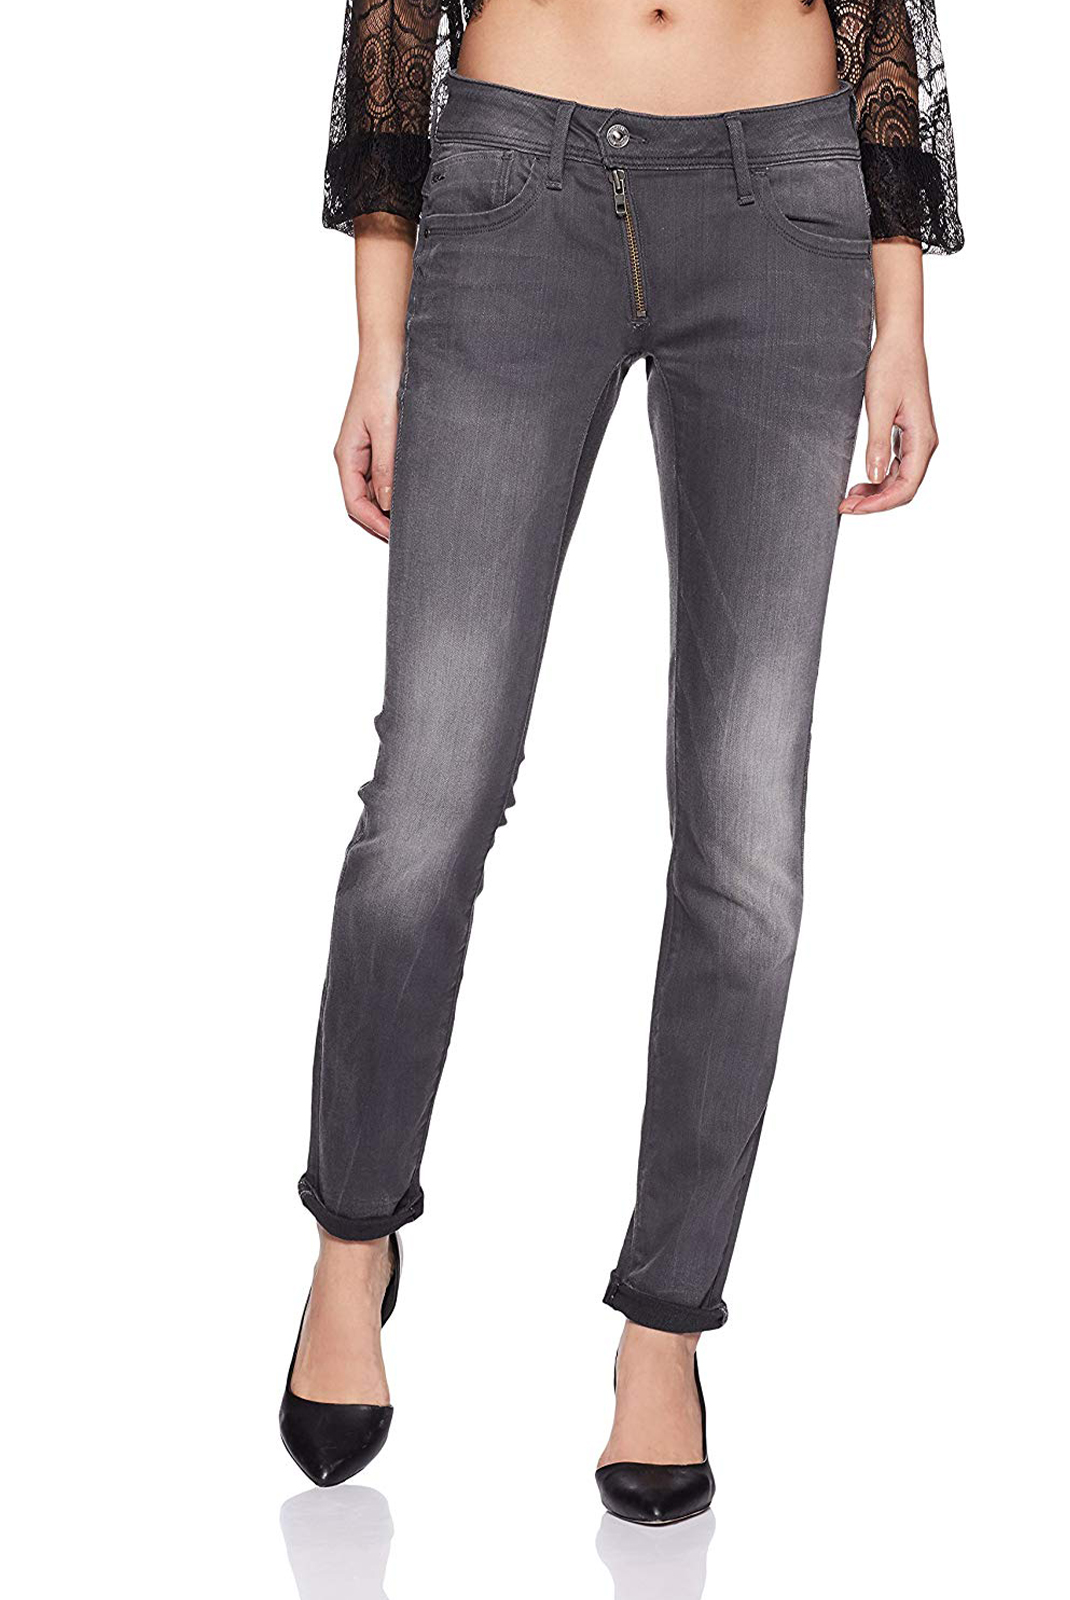 Jeans   G-star 60887-6132-071 lynn gris